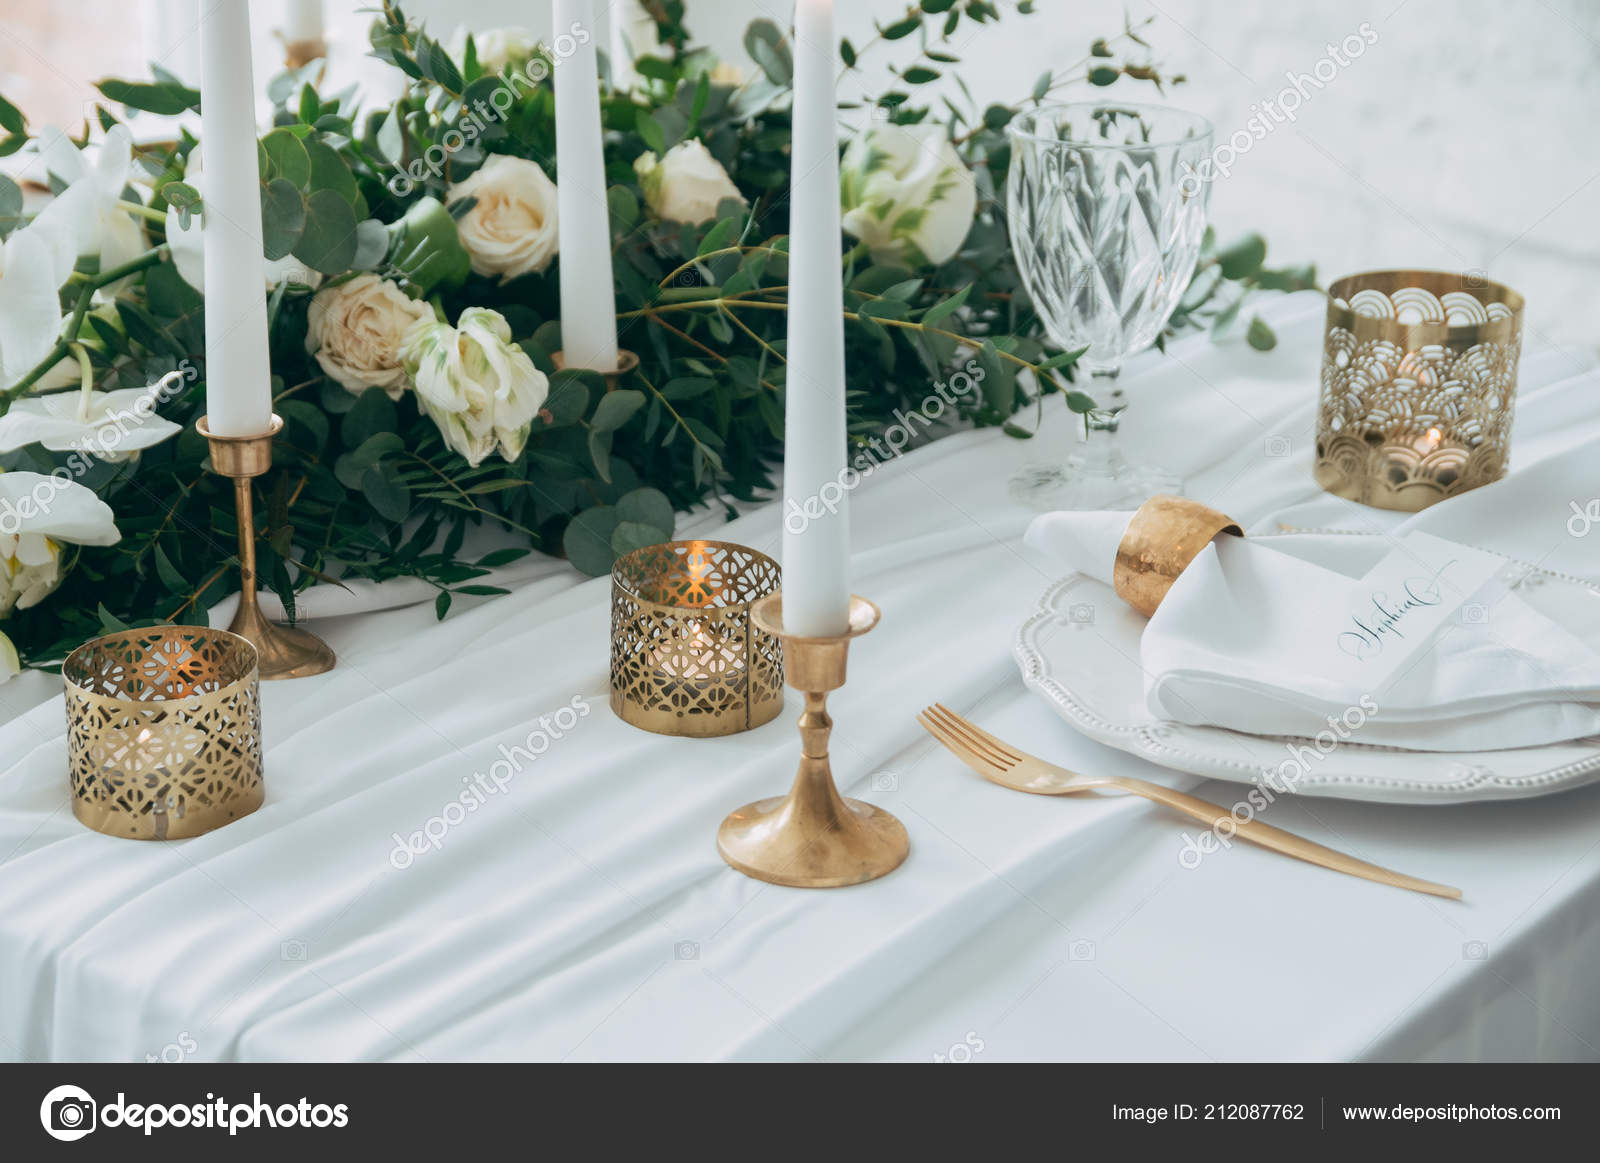 Wedding Decor Flowers Black Gold Decor Candles Stock Photo